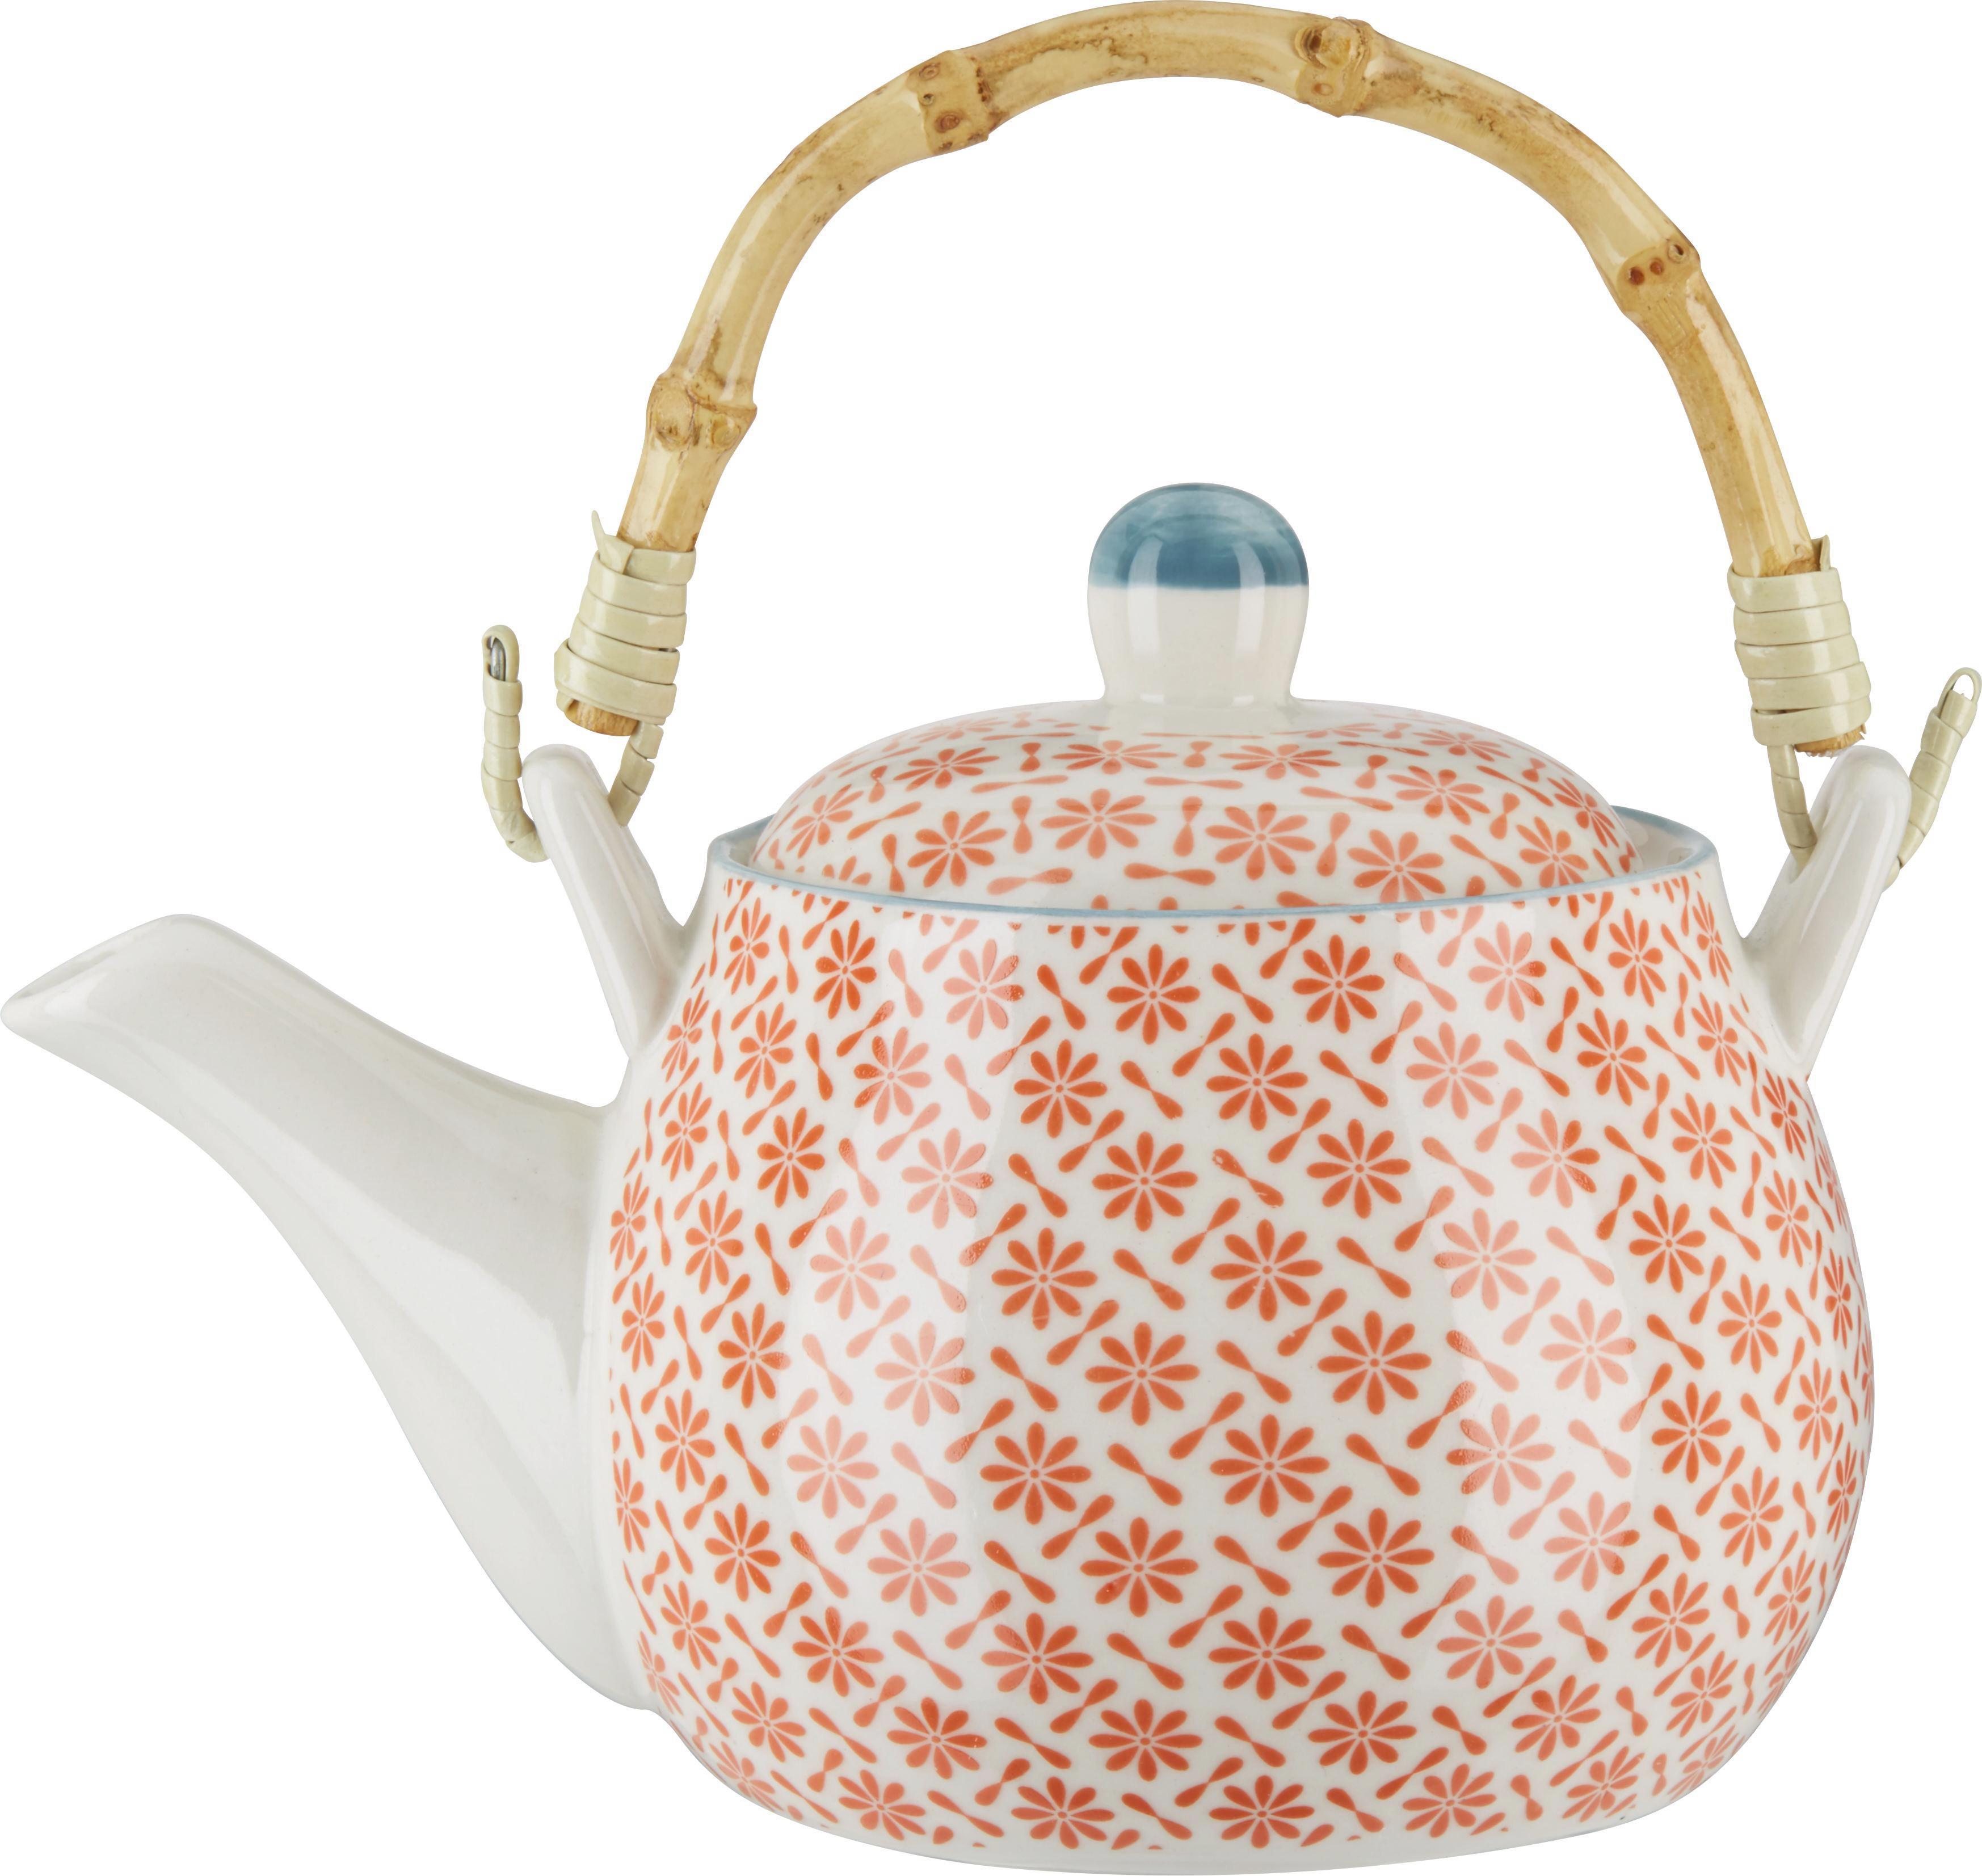 Teekanne Shakti aus Porzellan - Multicolor, LIFESTYLE, Keramik (17,8/11cm) - MÖMAX modern living